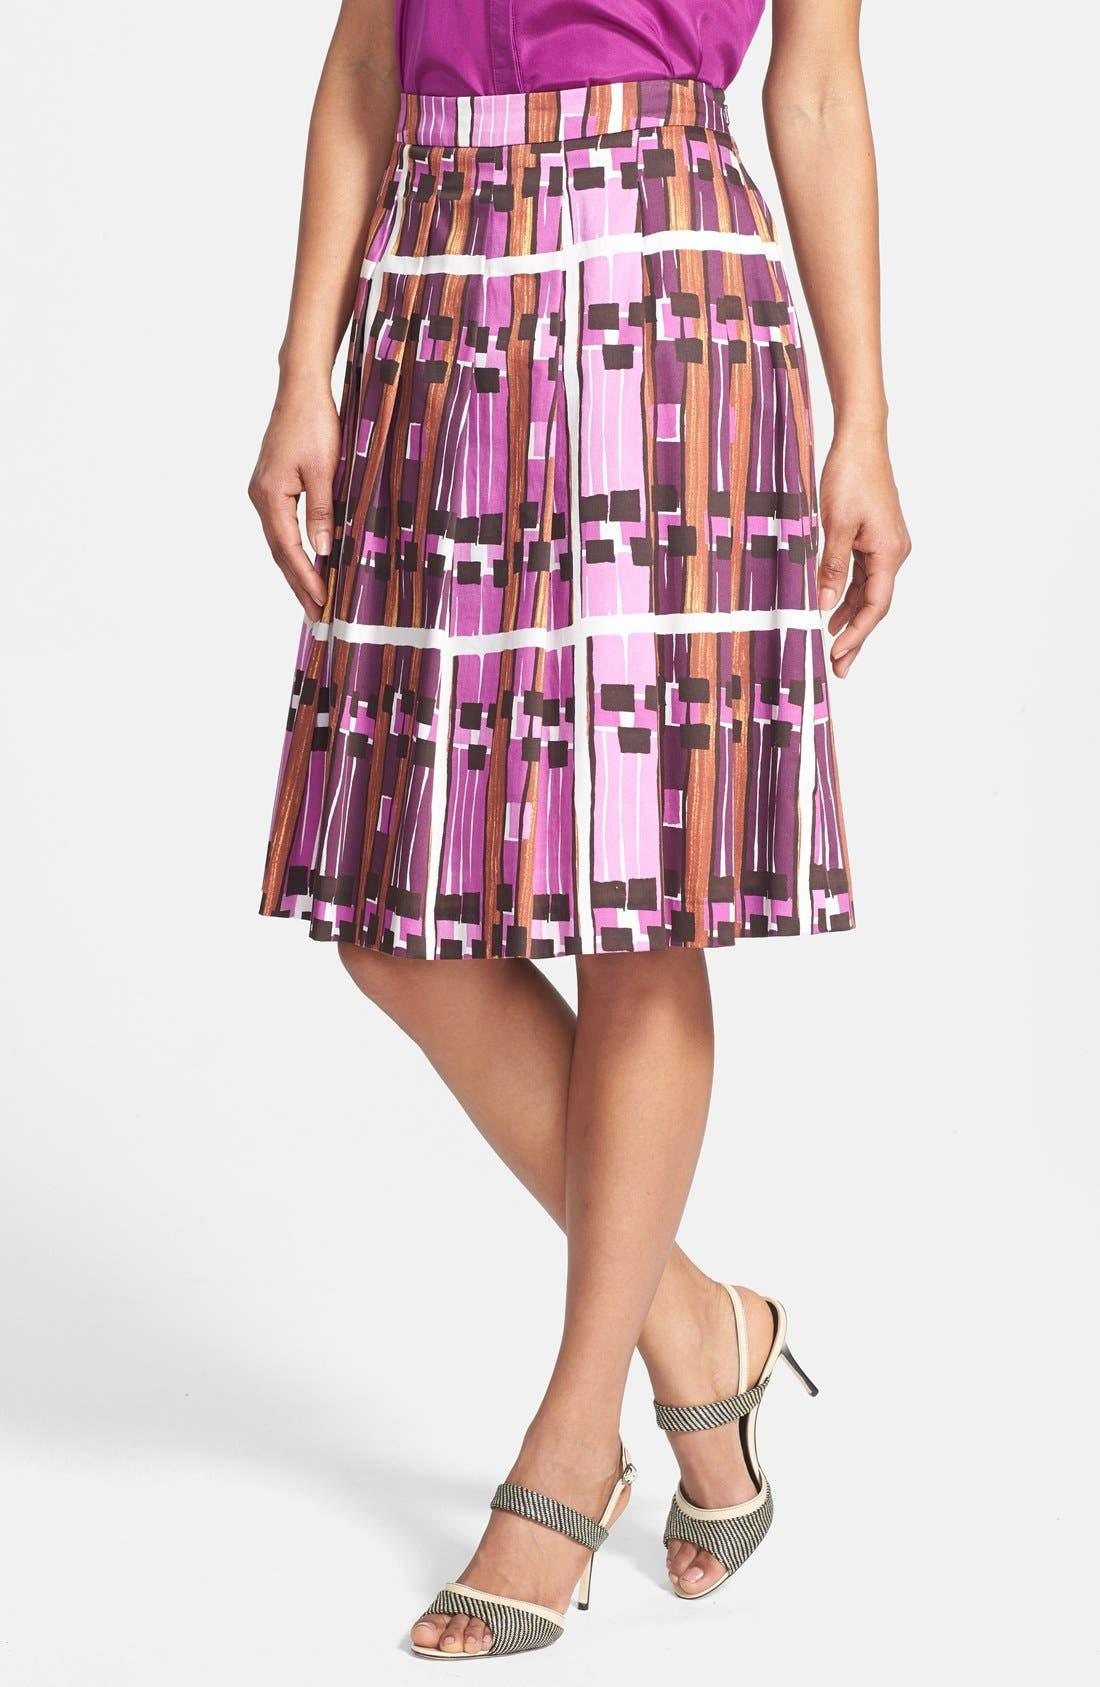 Alternate Image 1 Selected - Weekend Max Mara 'Borgia' Print Skirt